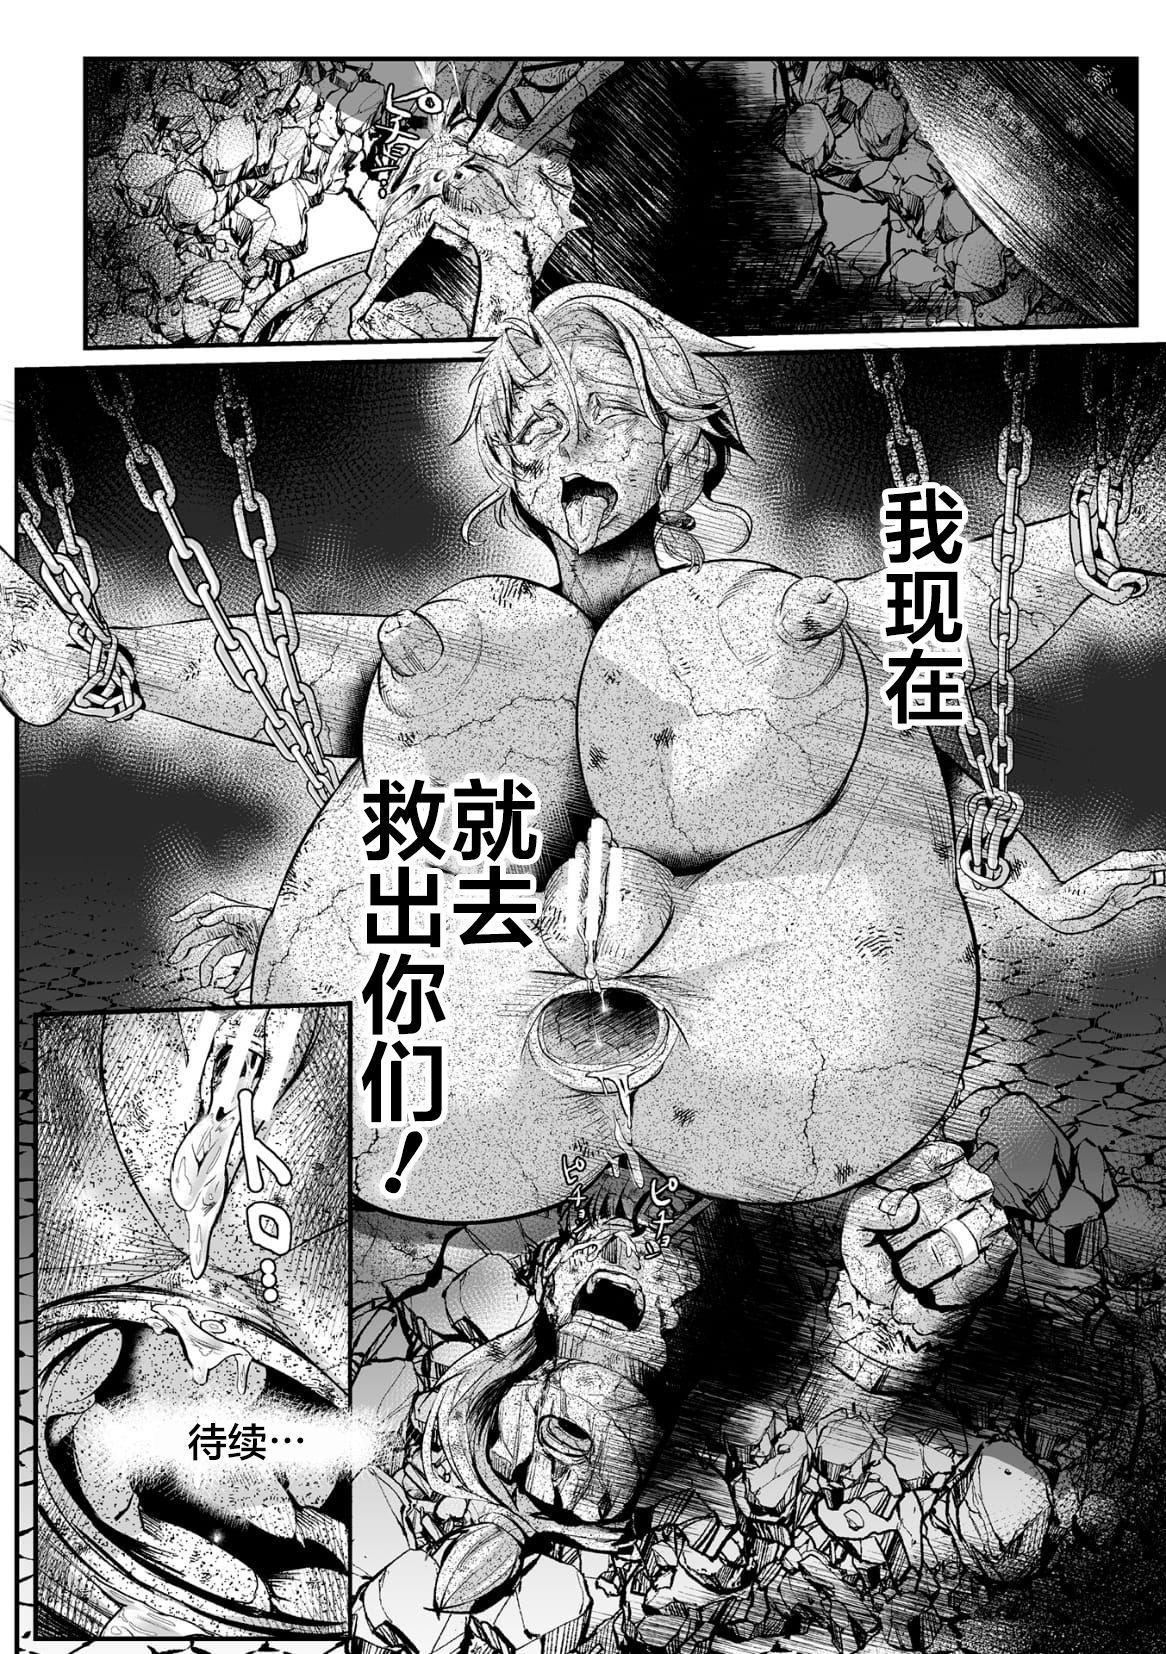 [Mou] Sekkan Fuuin ~Enbi na Sekizou ni Otosareshi Yuusha Ichizoku~ Ch. 1 [Chinese] [不咕鸟汉化组] 29